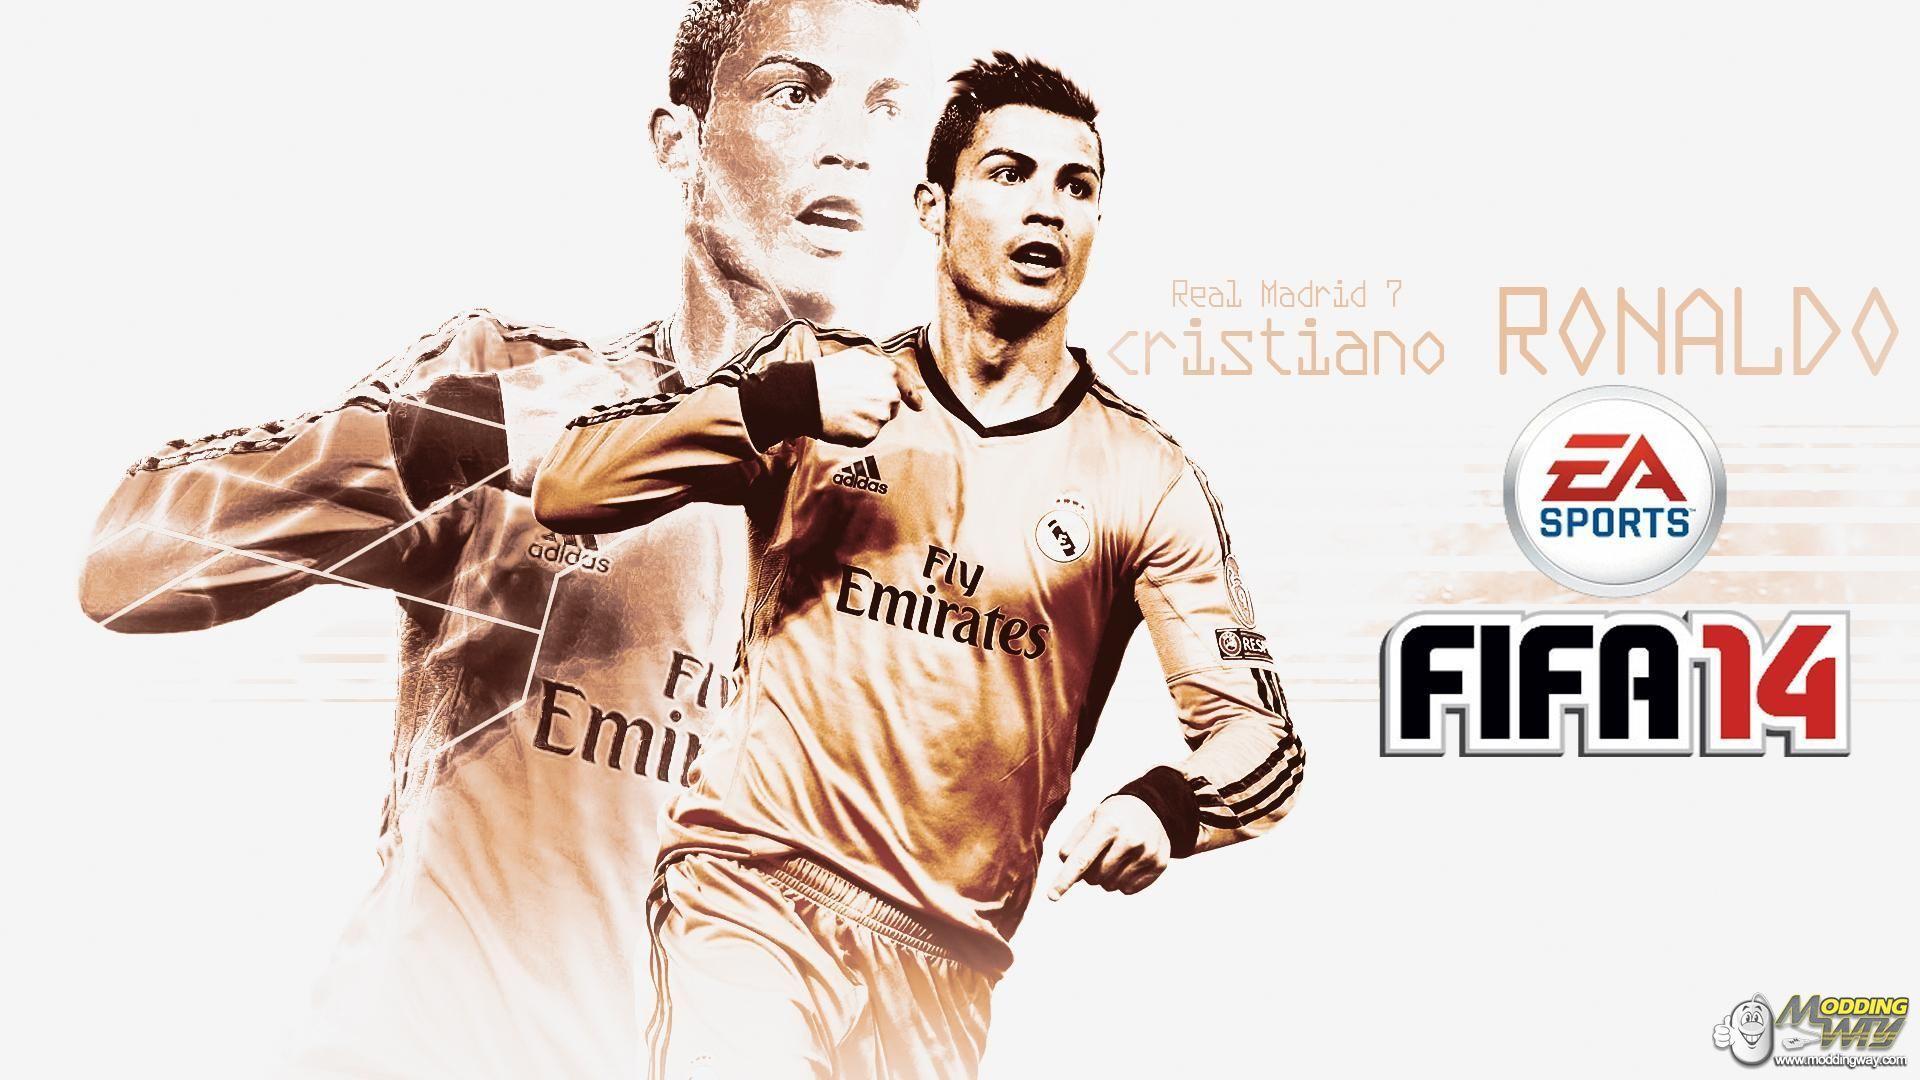 Fifa 14 ronaldo google search top 5 games of the last 5 years fifa 14 ronaldo google search voltagebd Images